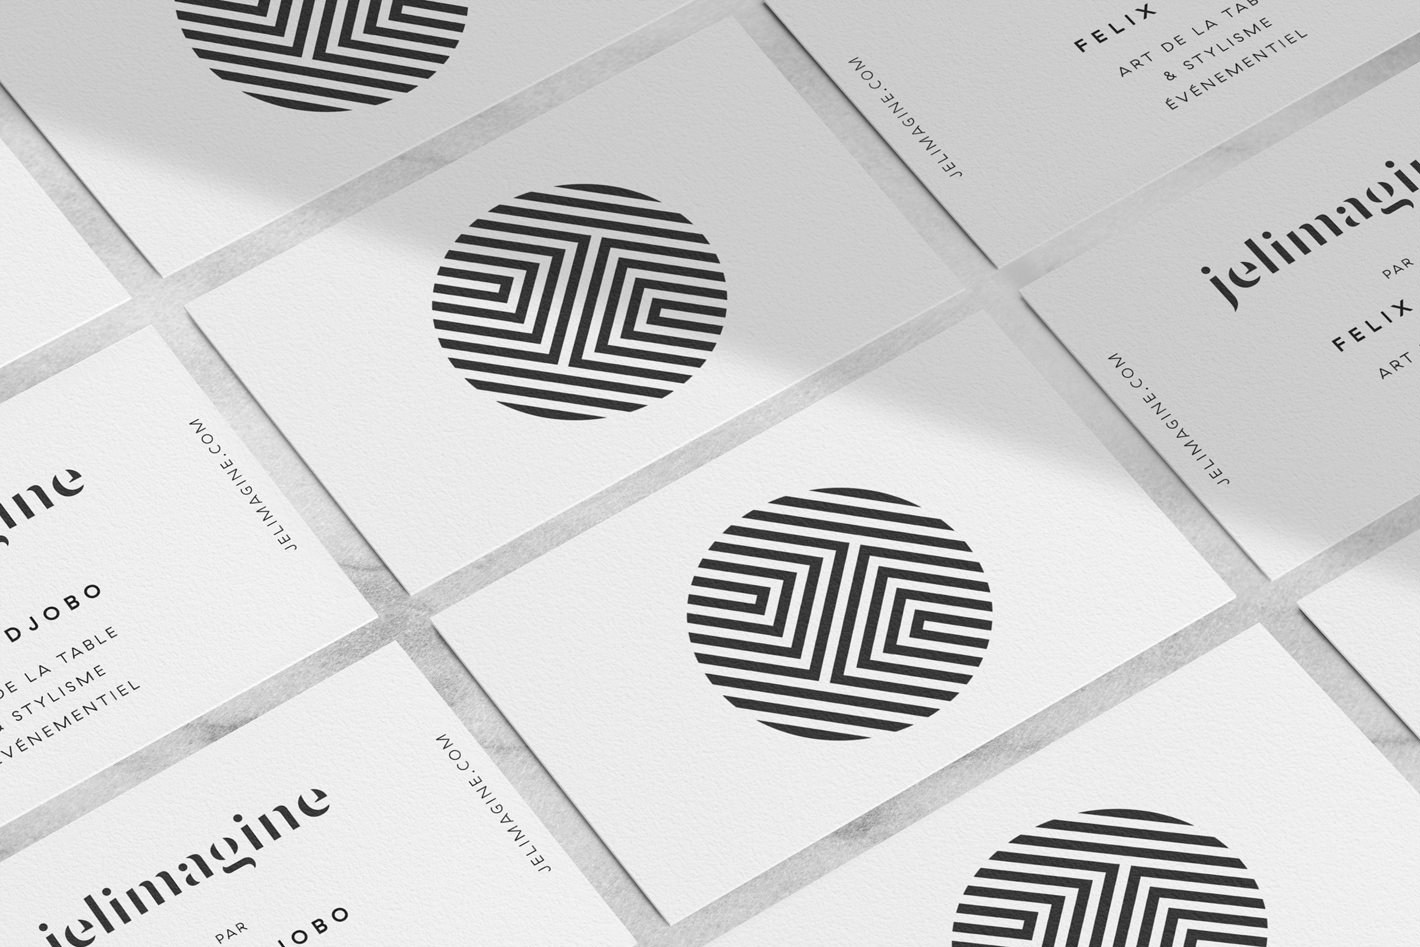 Figure-Jeremy-Hall-Design-Graphique-Logo-Branding-Image-De-Marque-Jelimagine-9.jpg